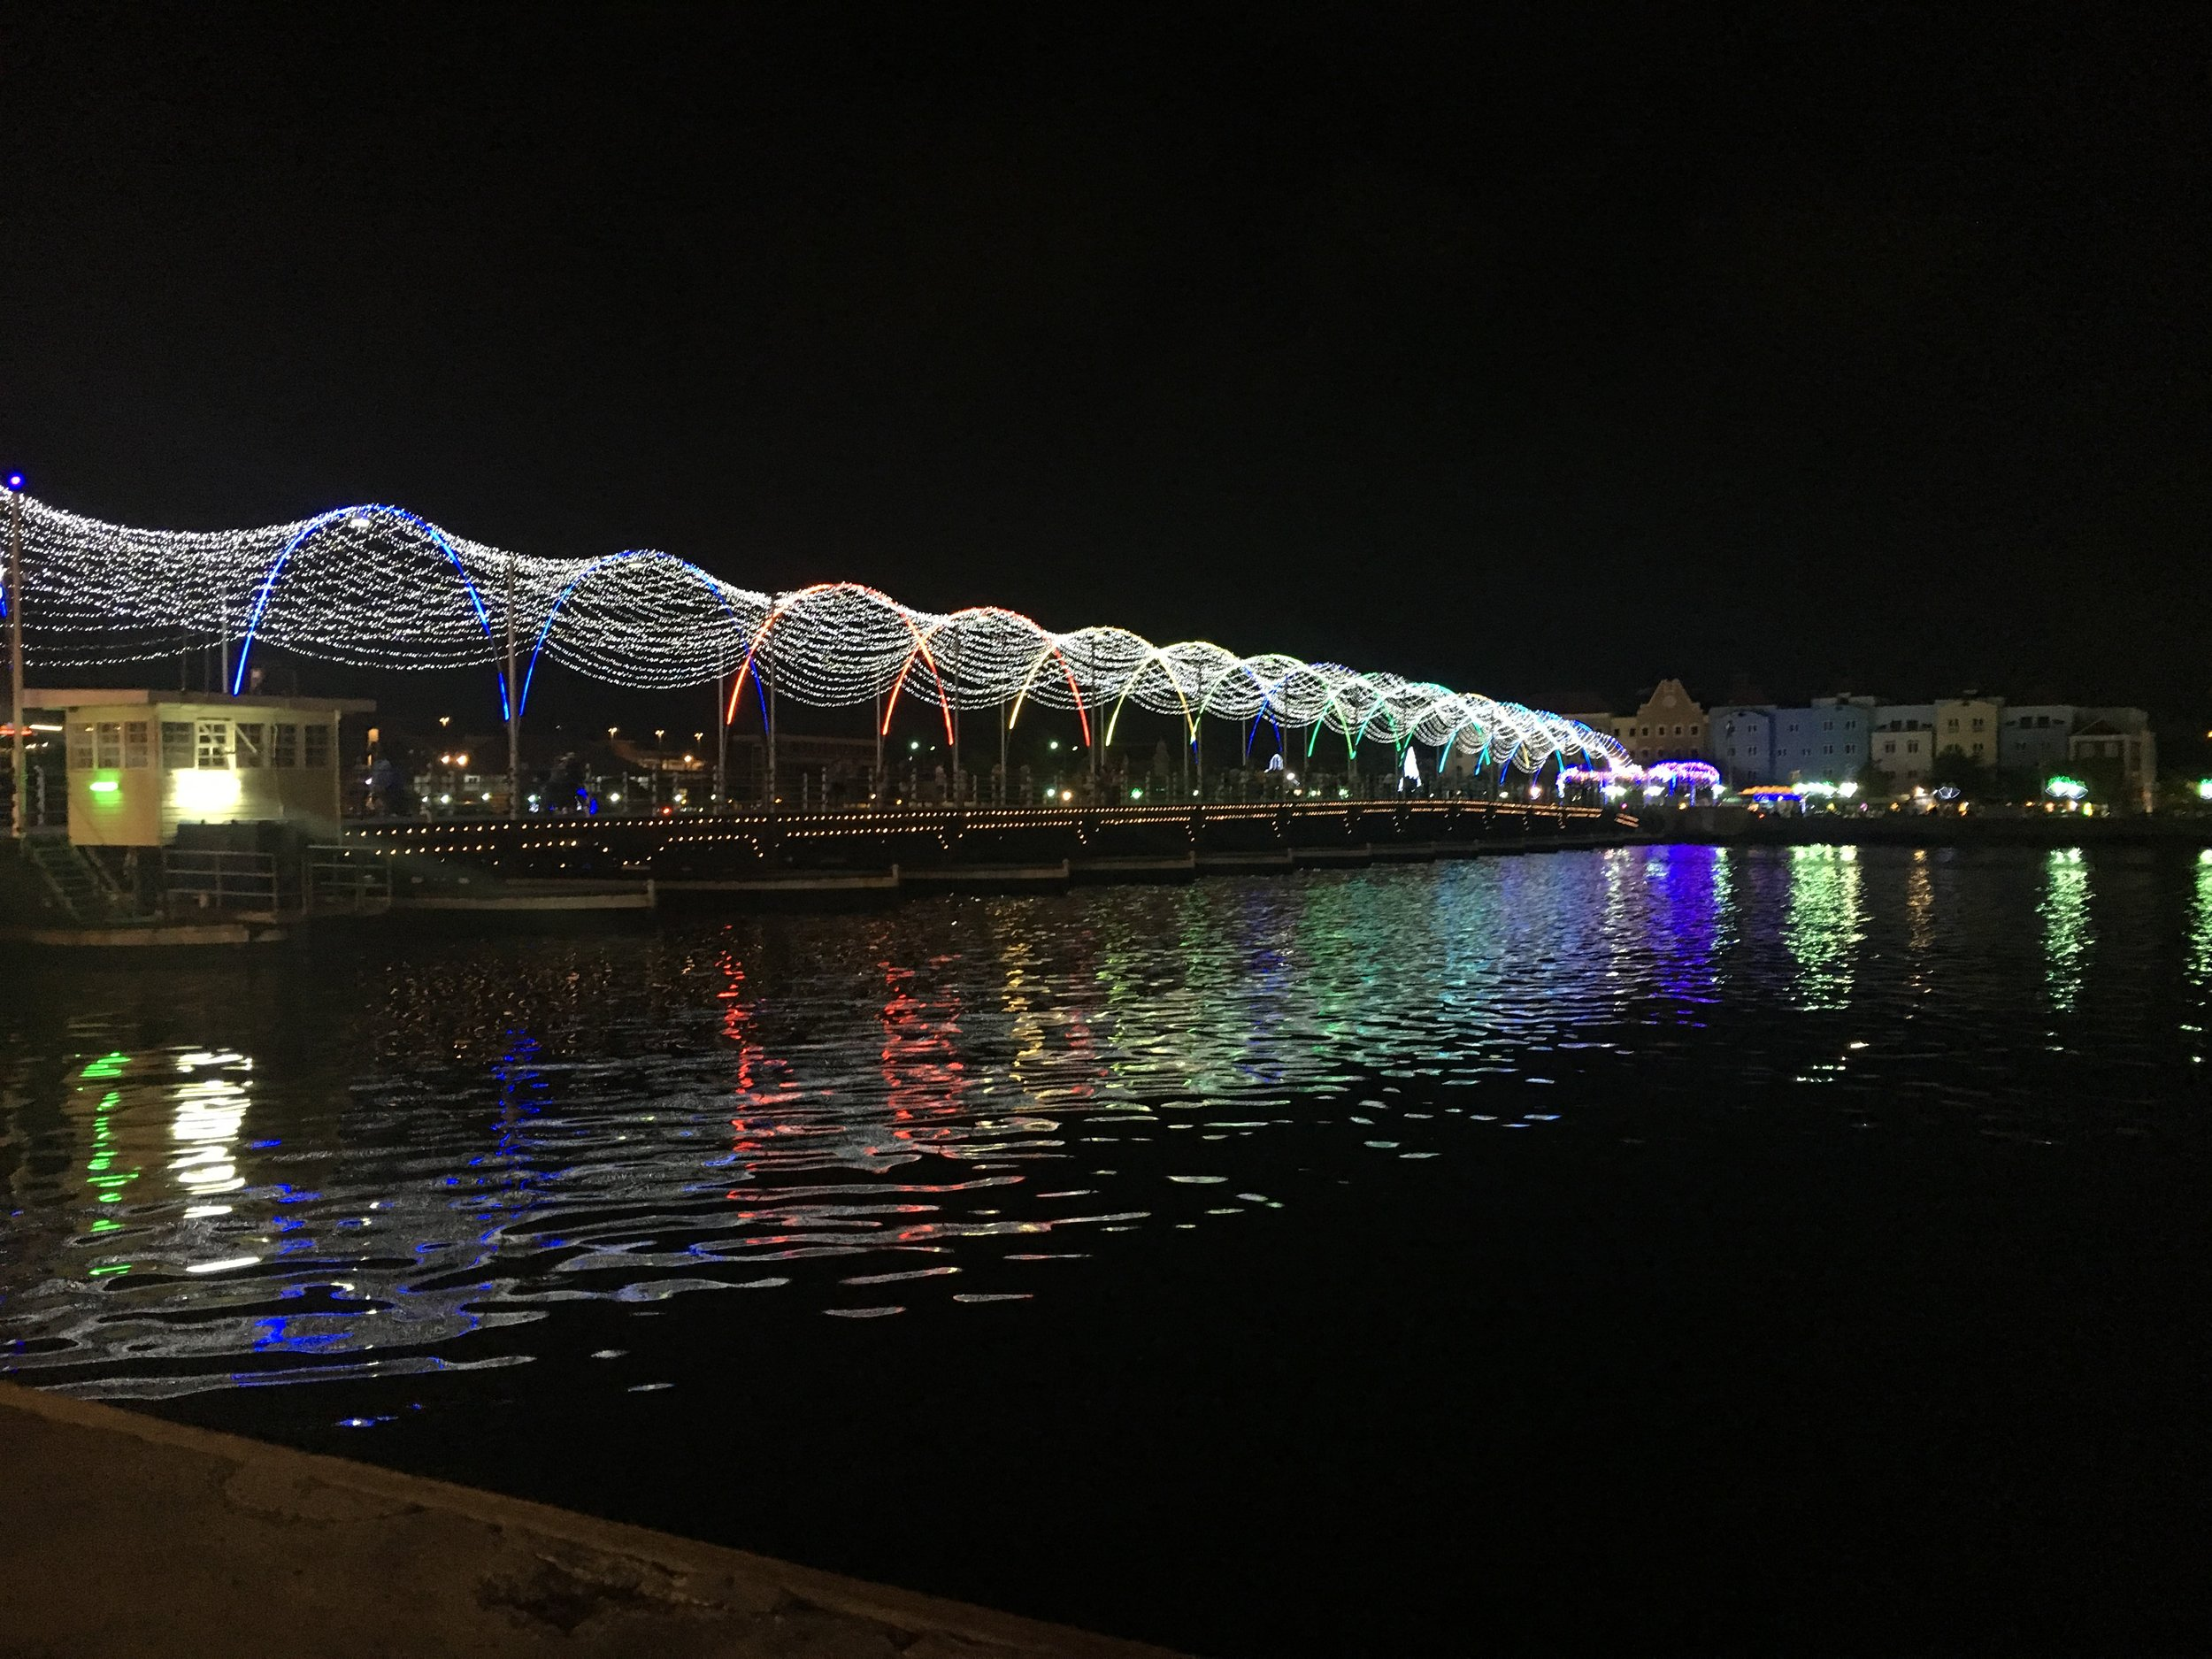 Queen Anne floating bridge lit at night